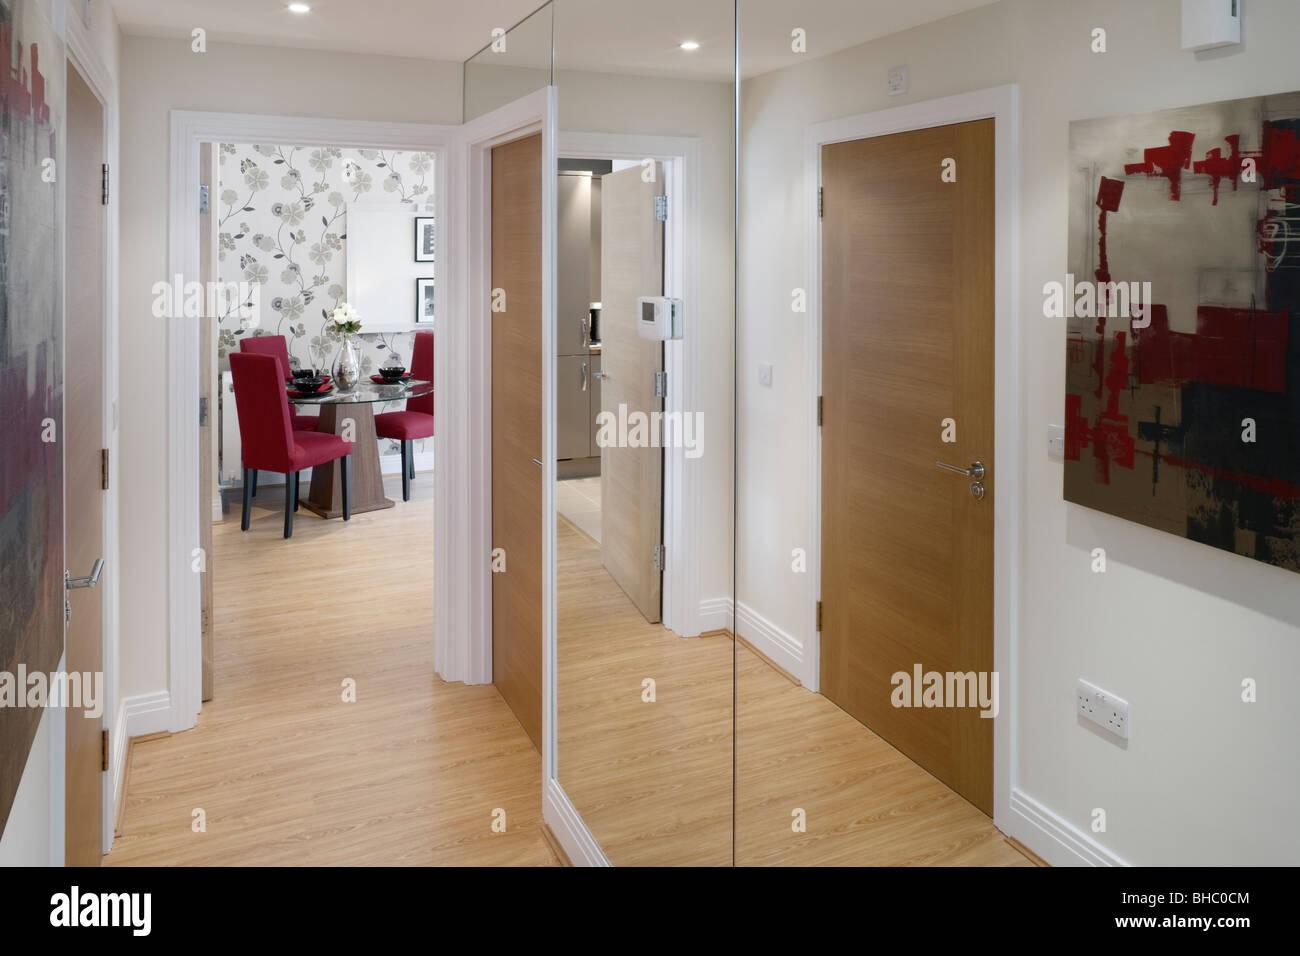 Hallway to dining room. 2008 interior design. - Stock Image